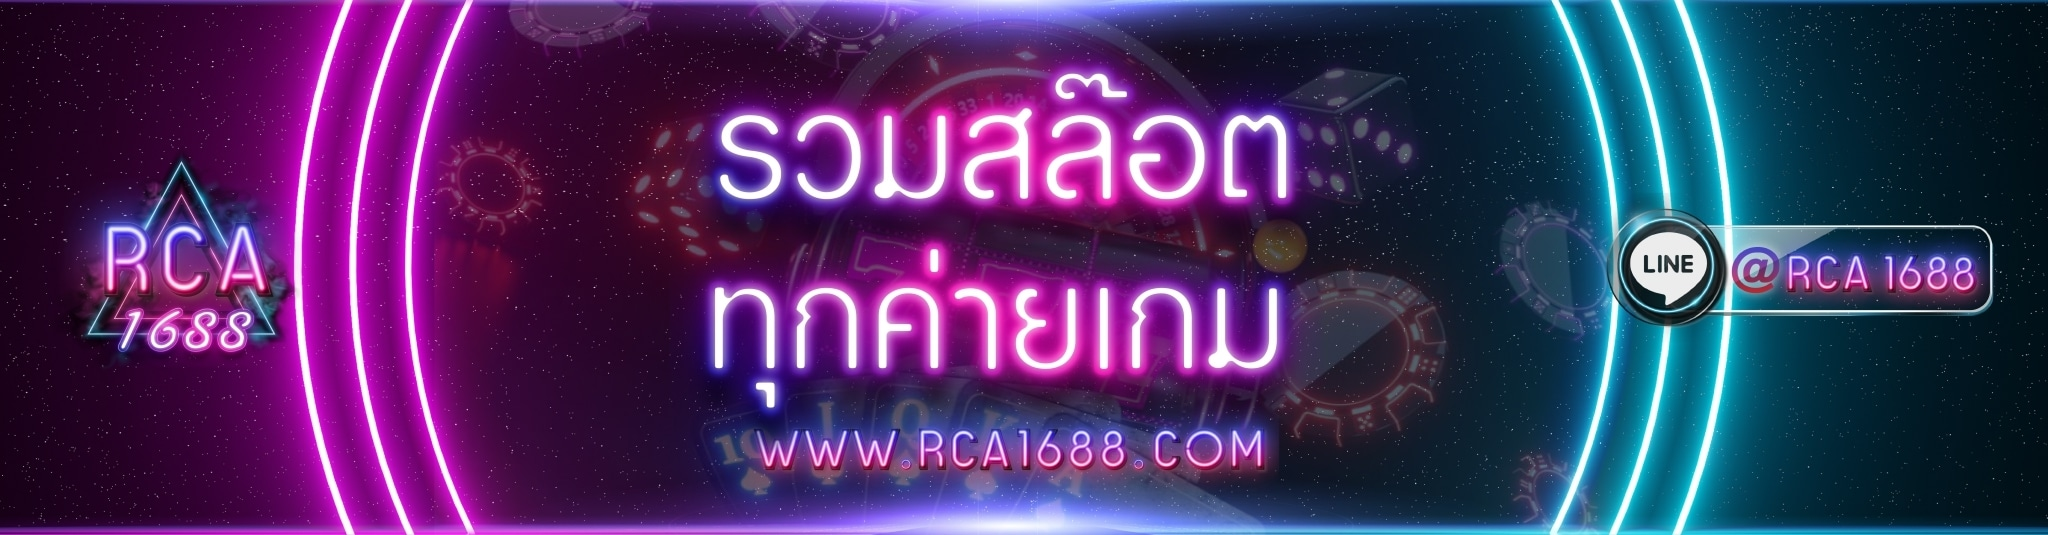 RCA1688_210209_0